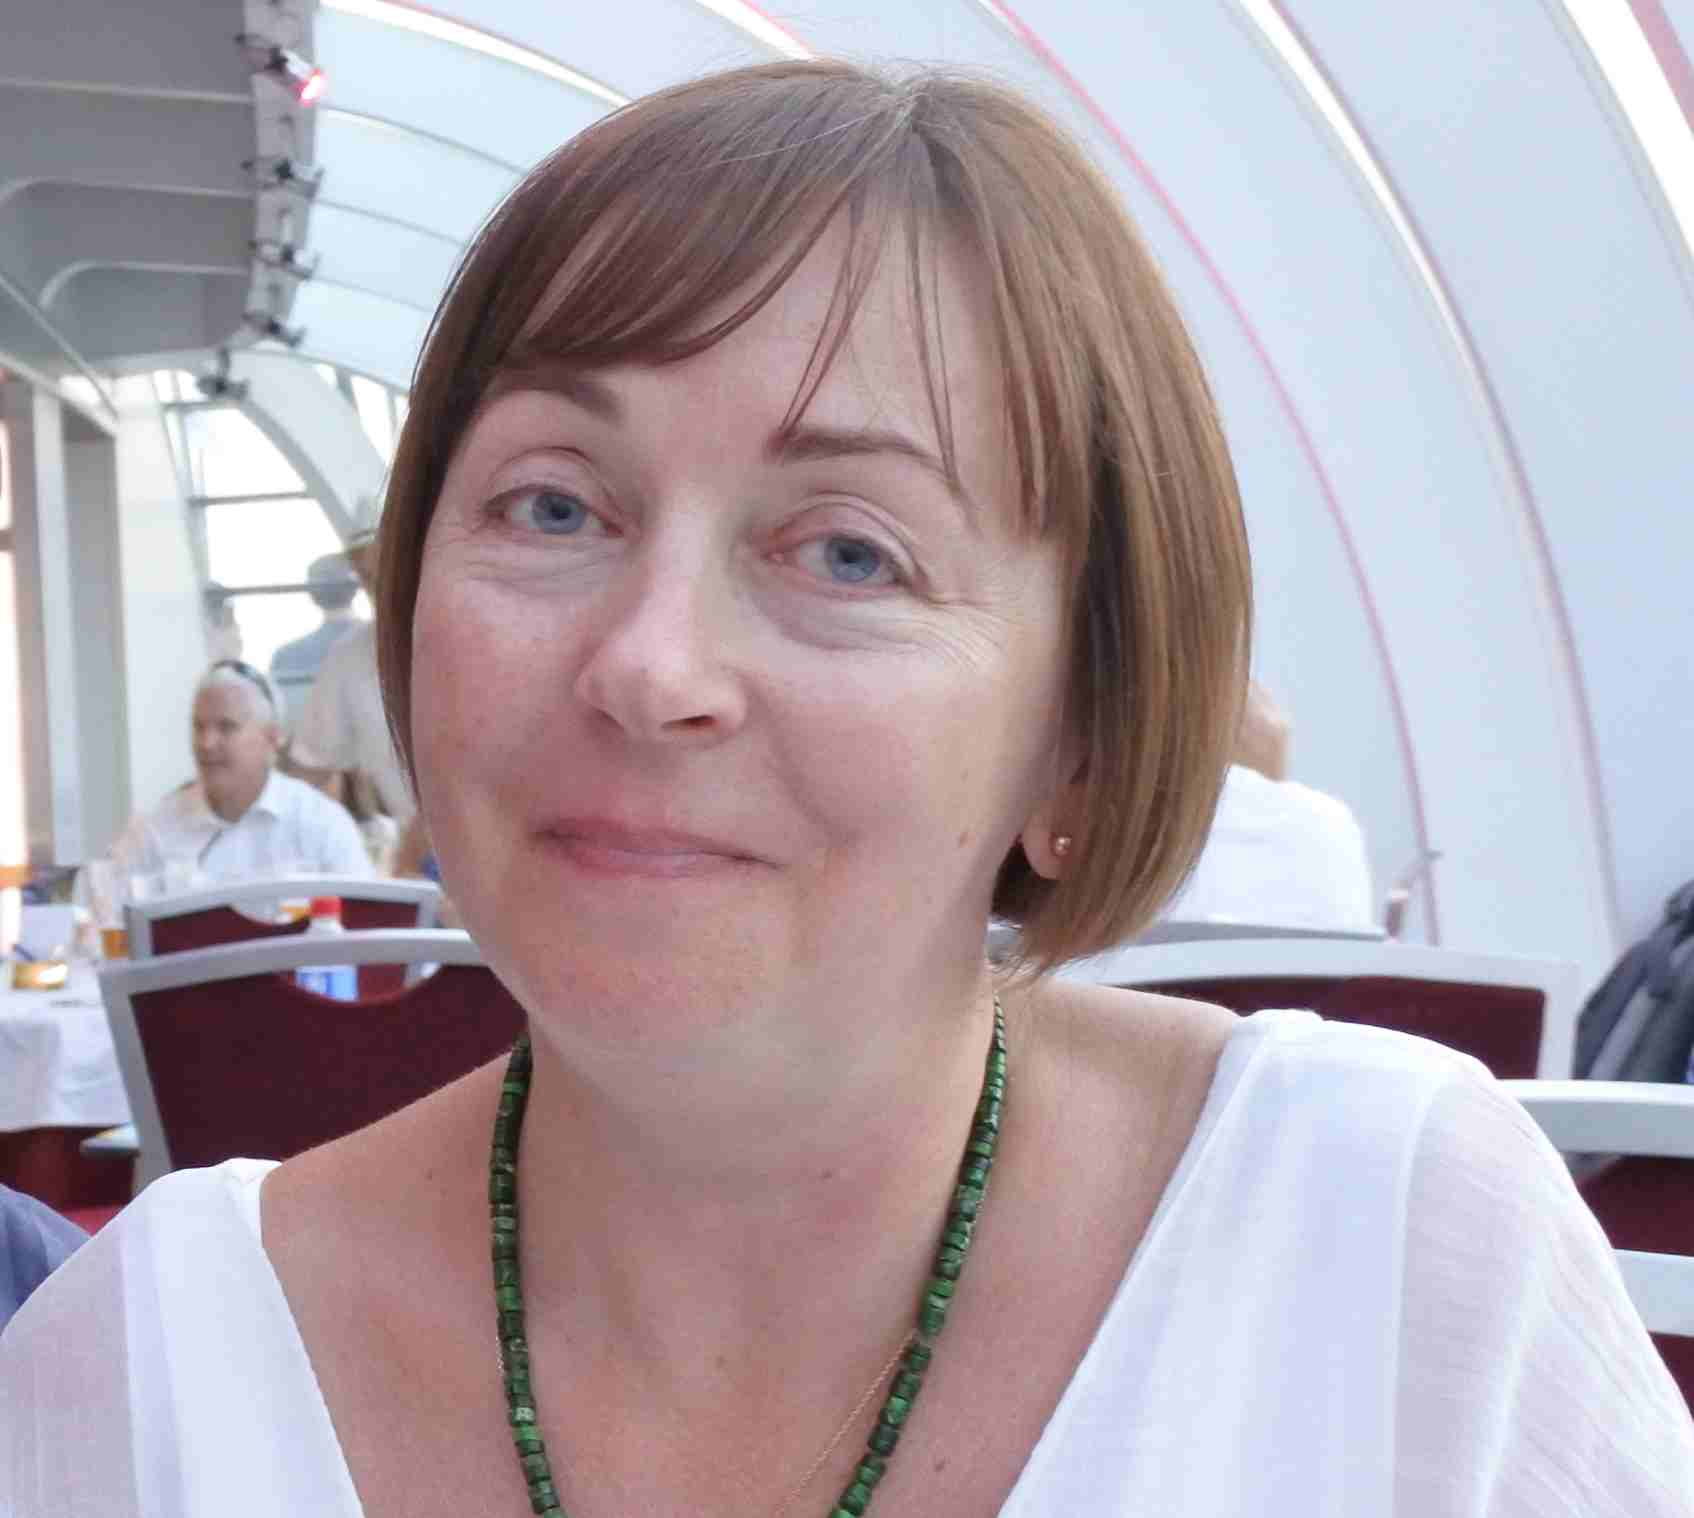 Reisexpert Moskou